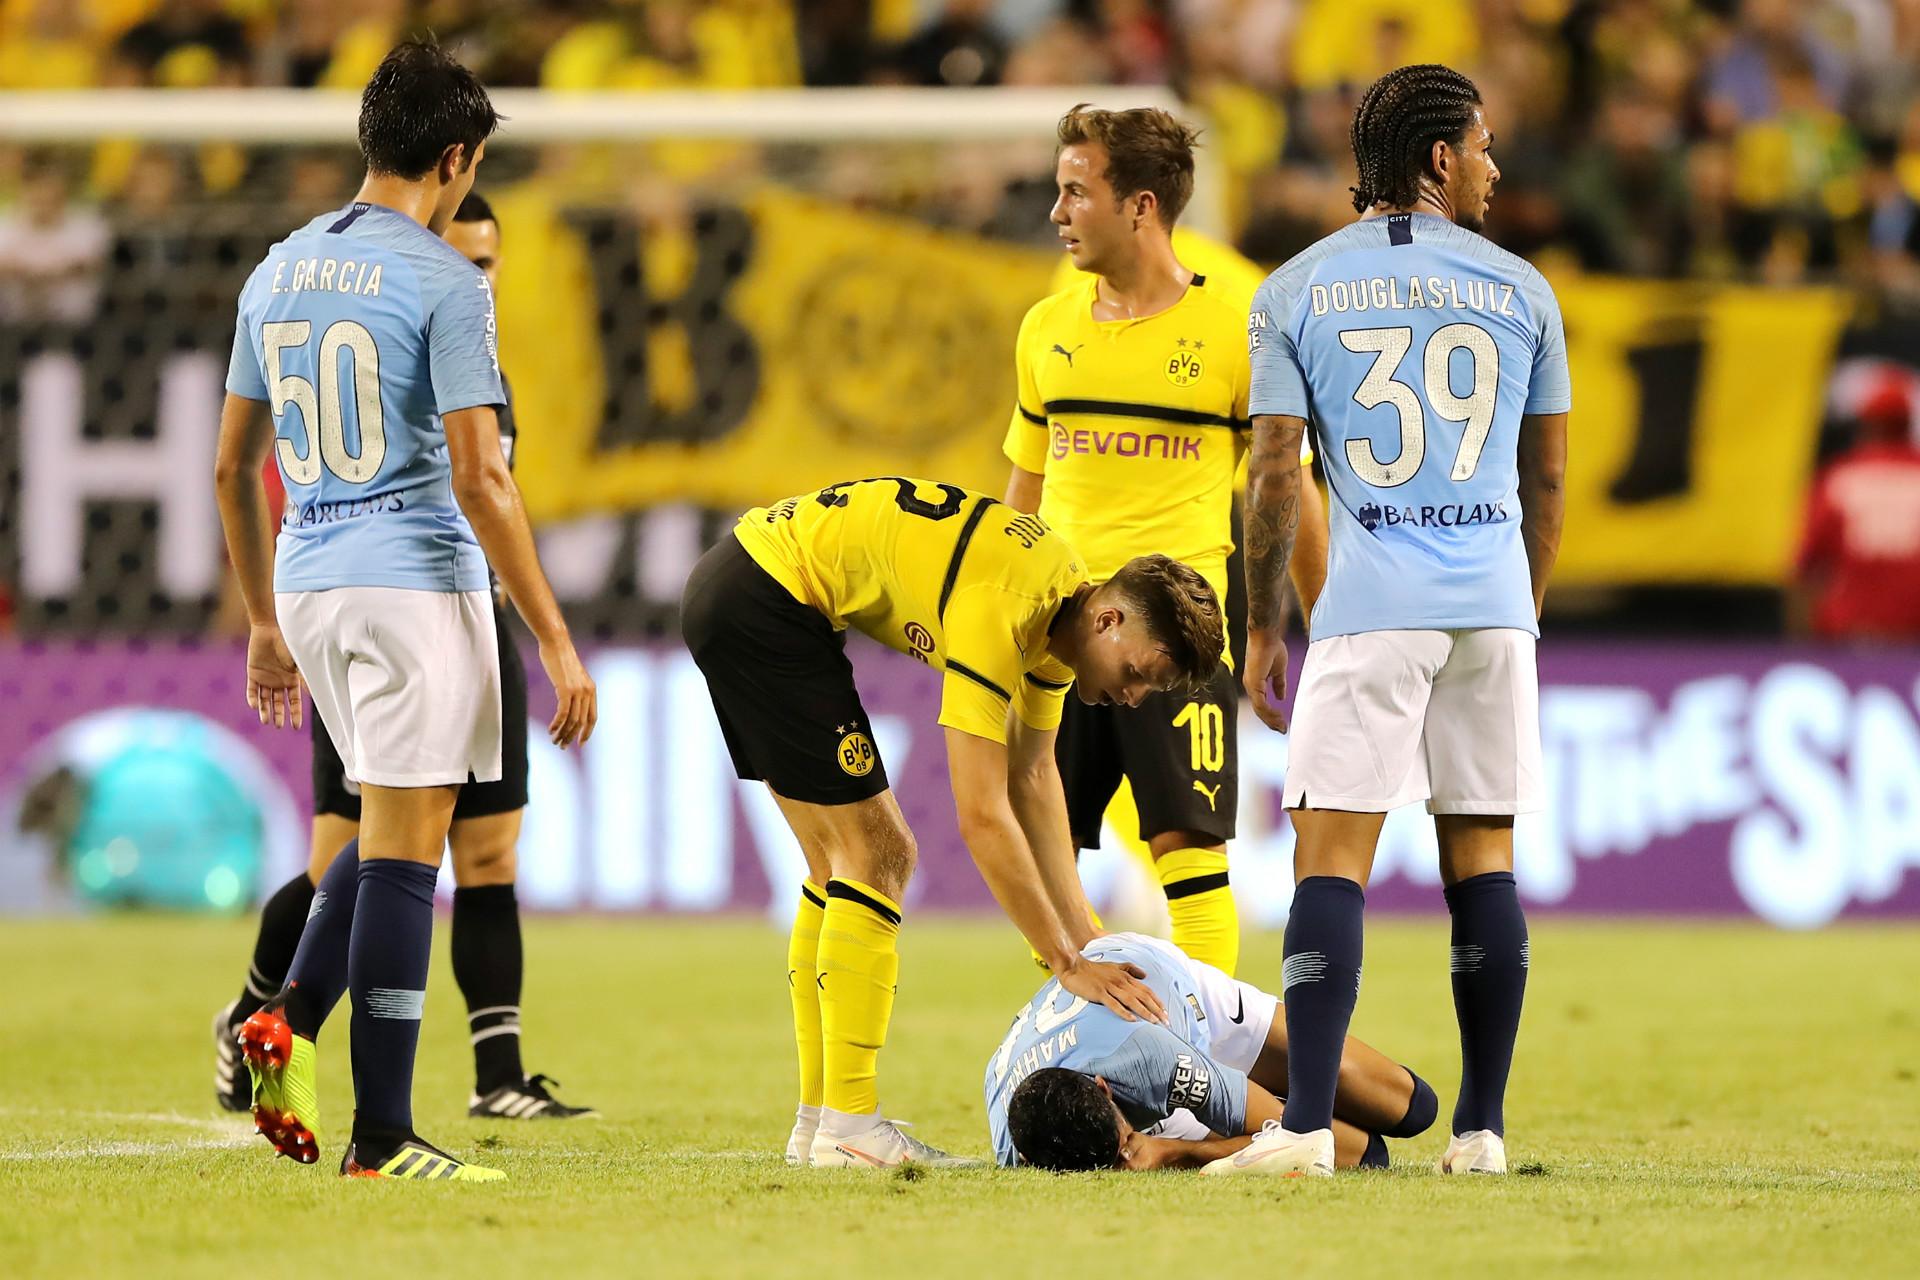 Manchester City Borussia Dortmund International Champions Cup 2018